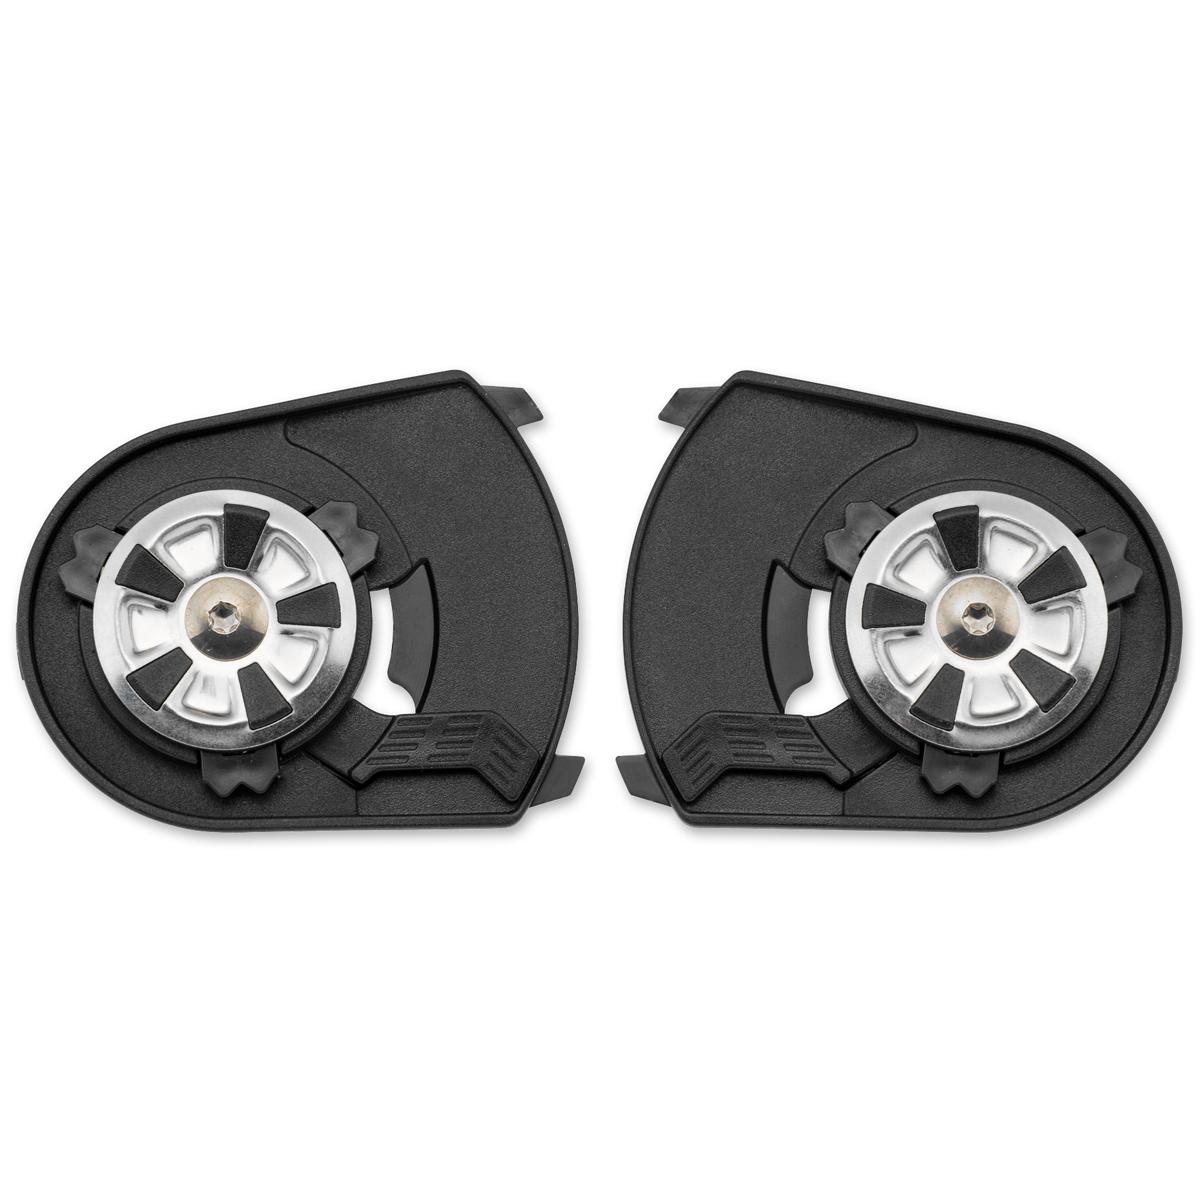 Nolan N44 Replacement Face Shield Pivot Kit